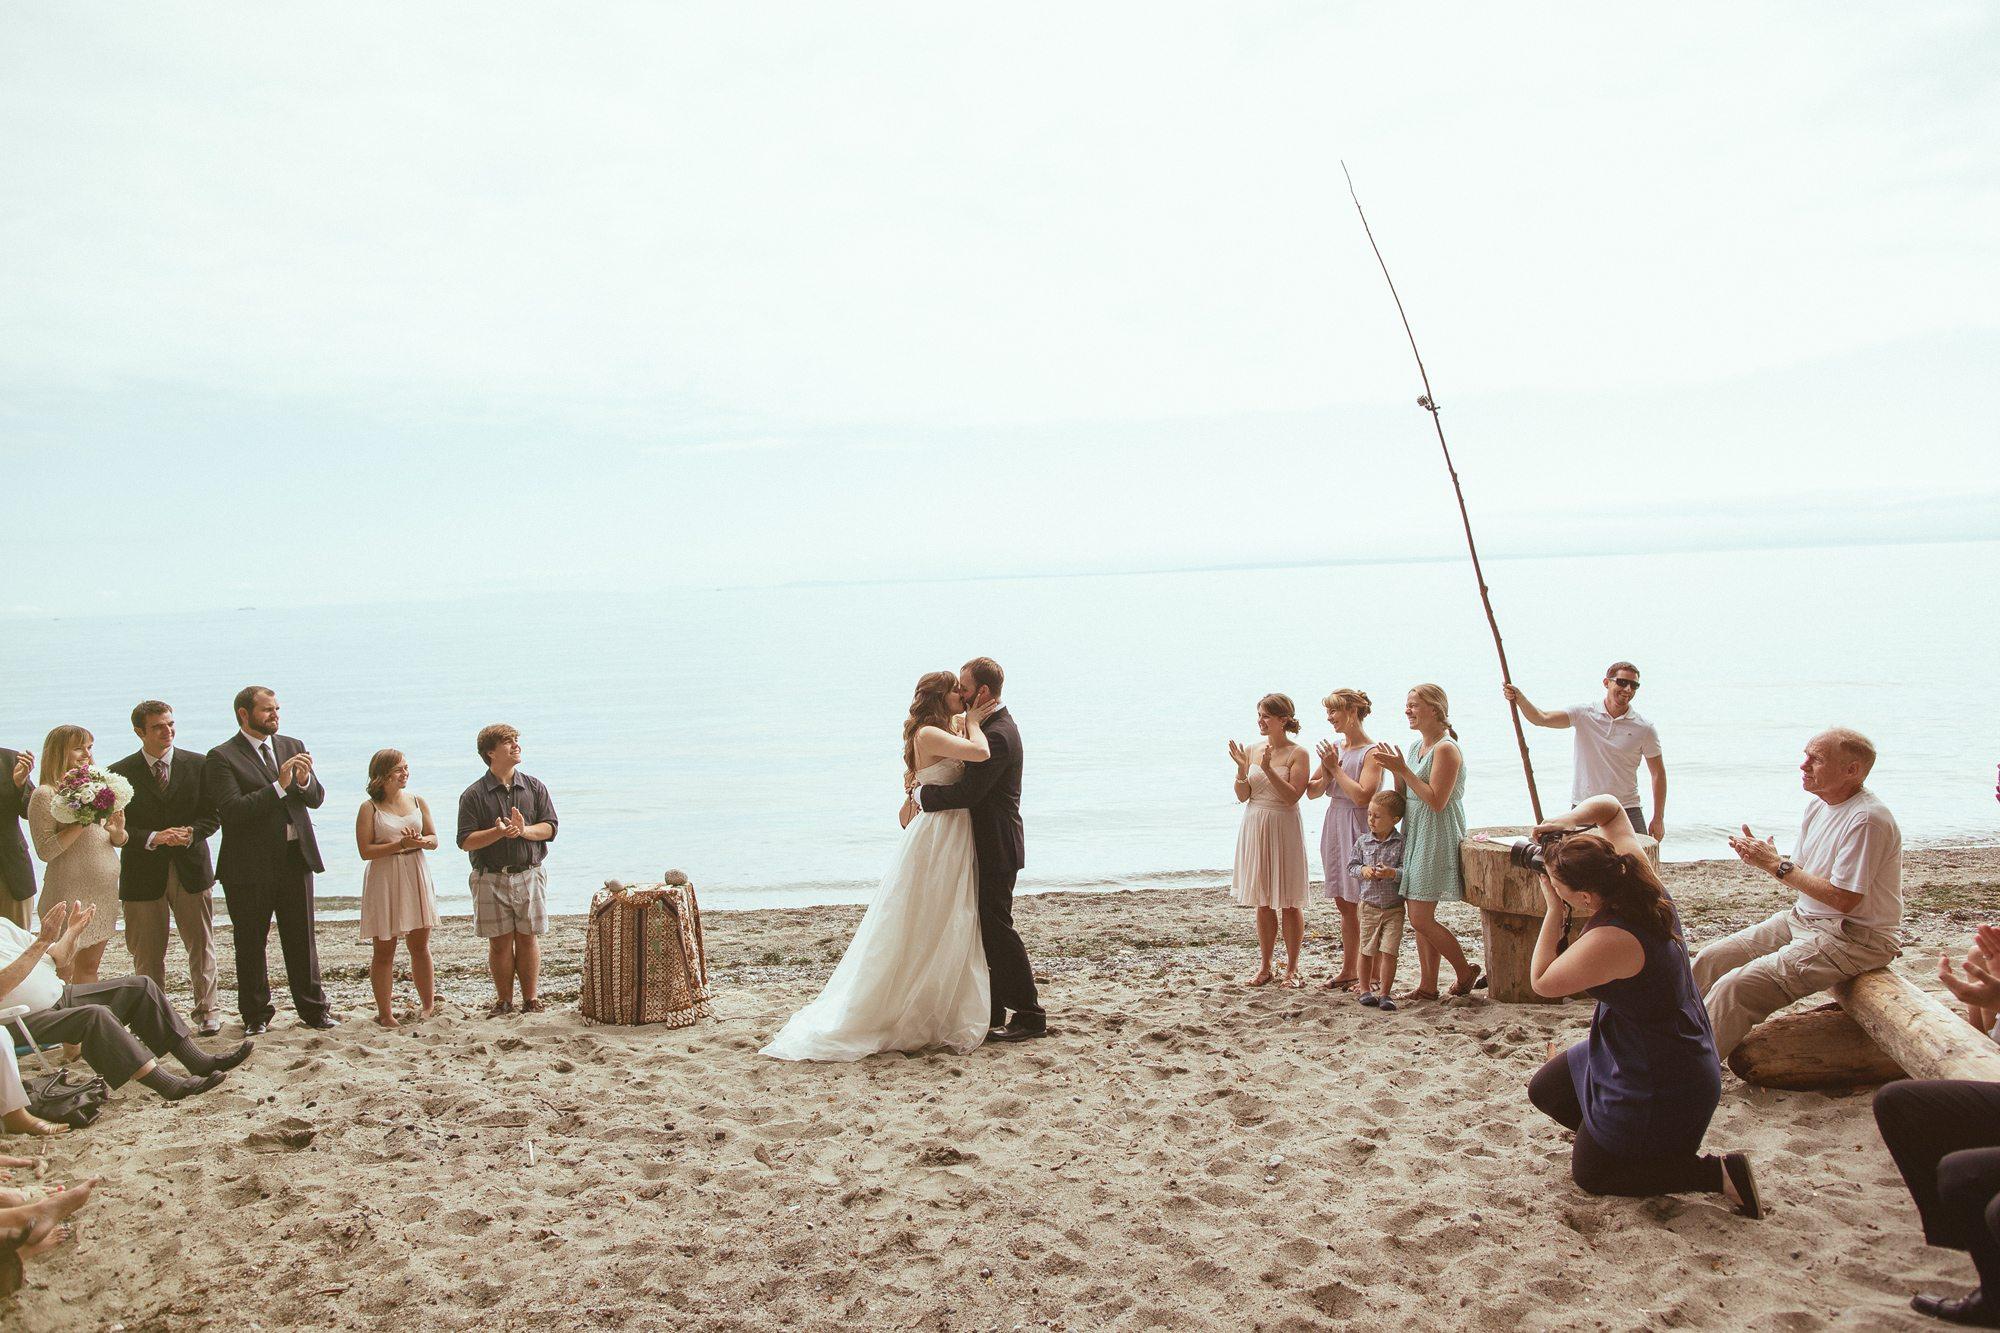 gibsons-wedding-photography-robert-devon29